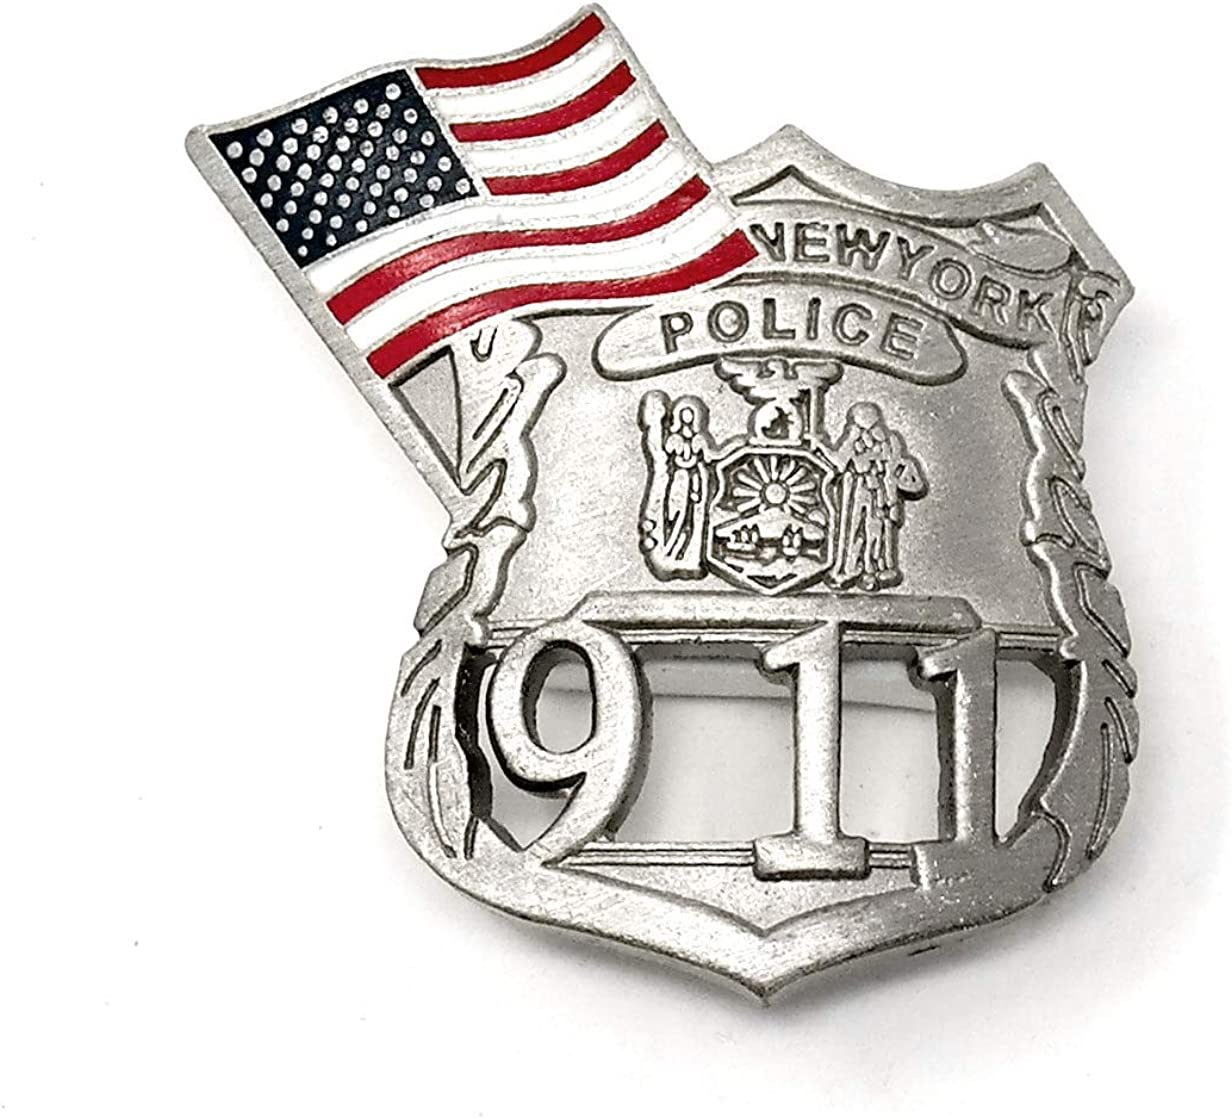 Statue Of Liberty 9-11 September 11th 9-11-01 Lapel Pin